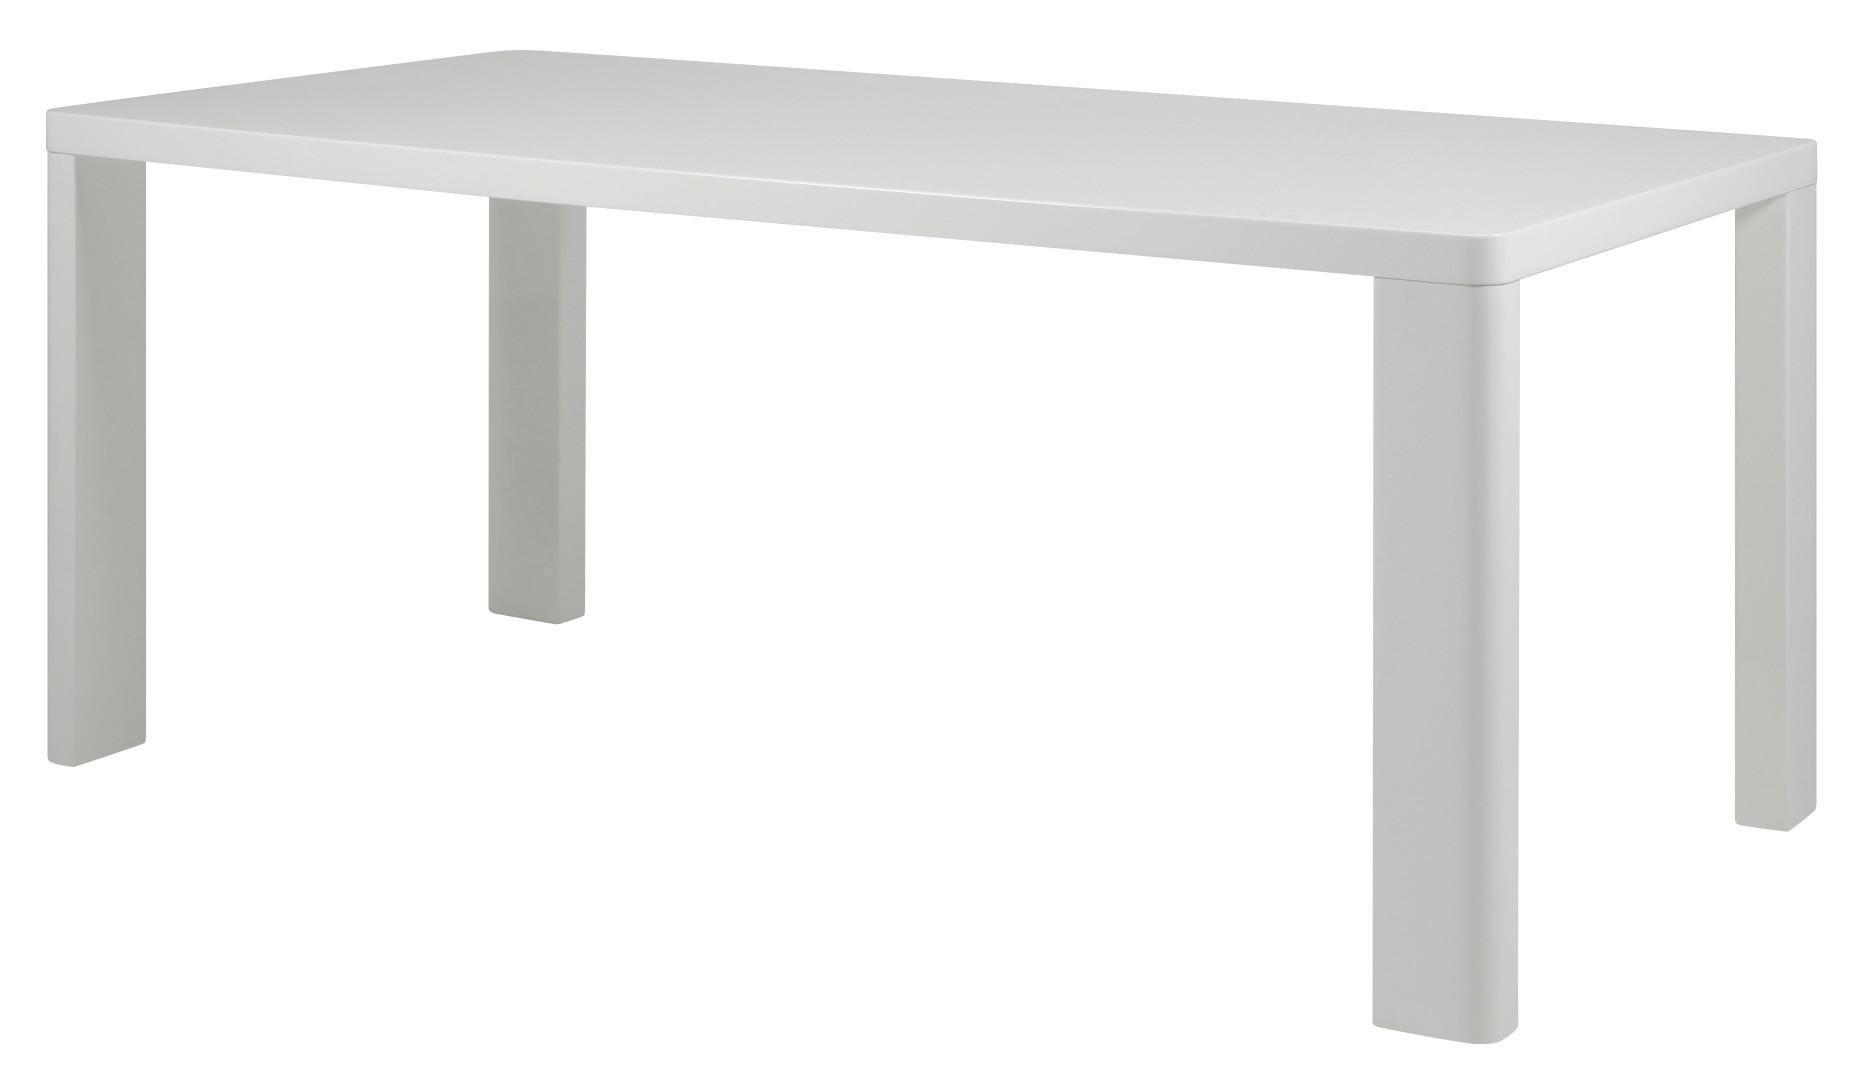 ... 90 cm wit hoogglans 24designs tafel asta 160 x 90 cm wit hoogglans